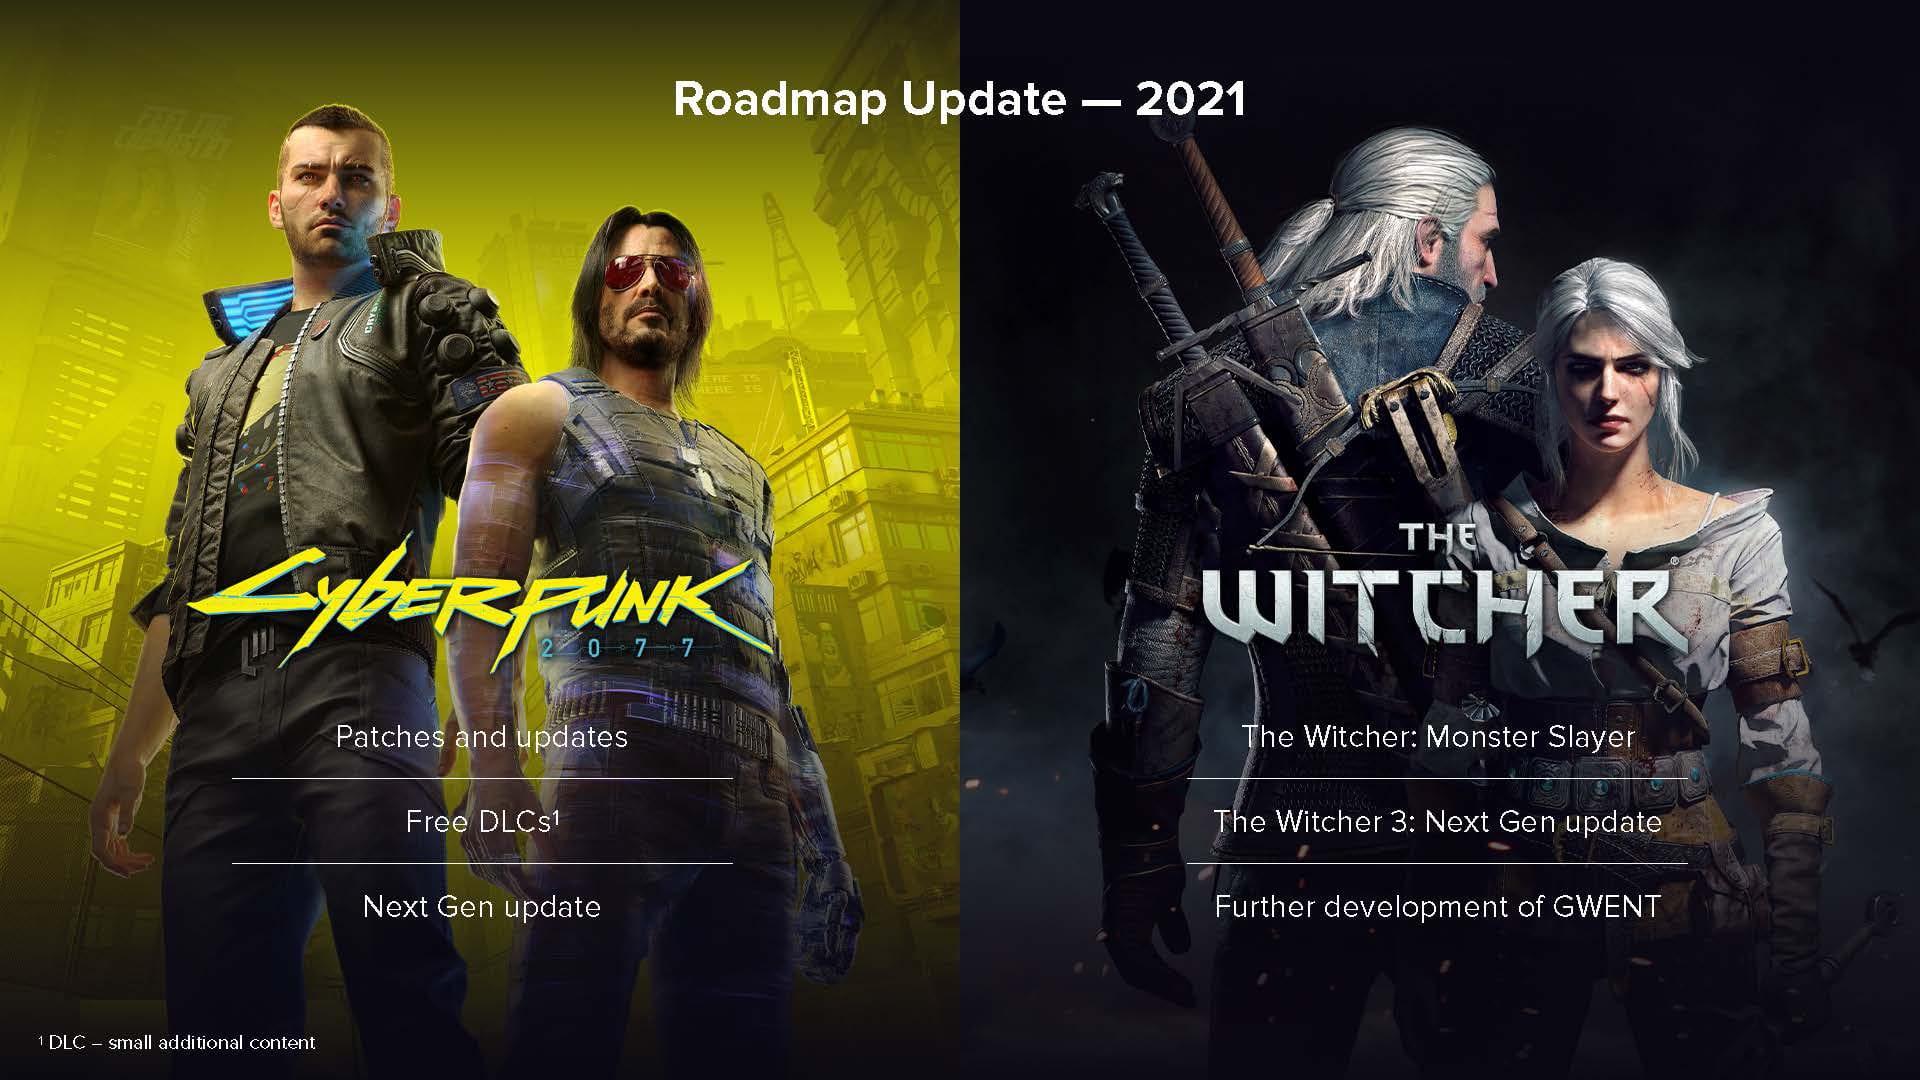 Cyberpunk 2077 The Witcher Roadmap 2021